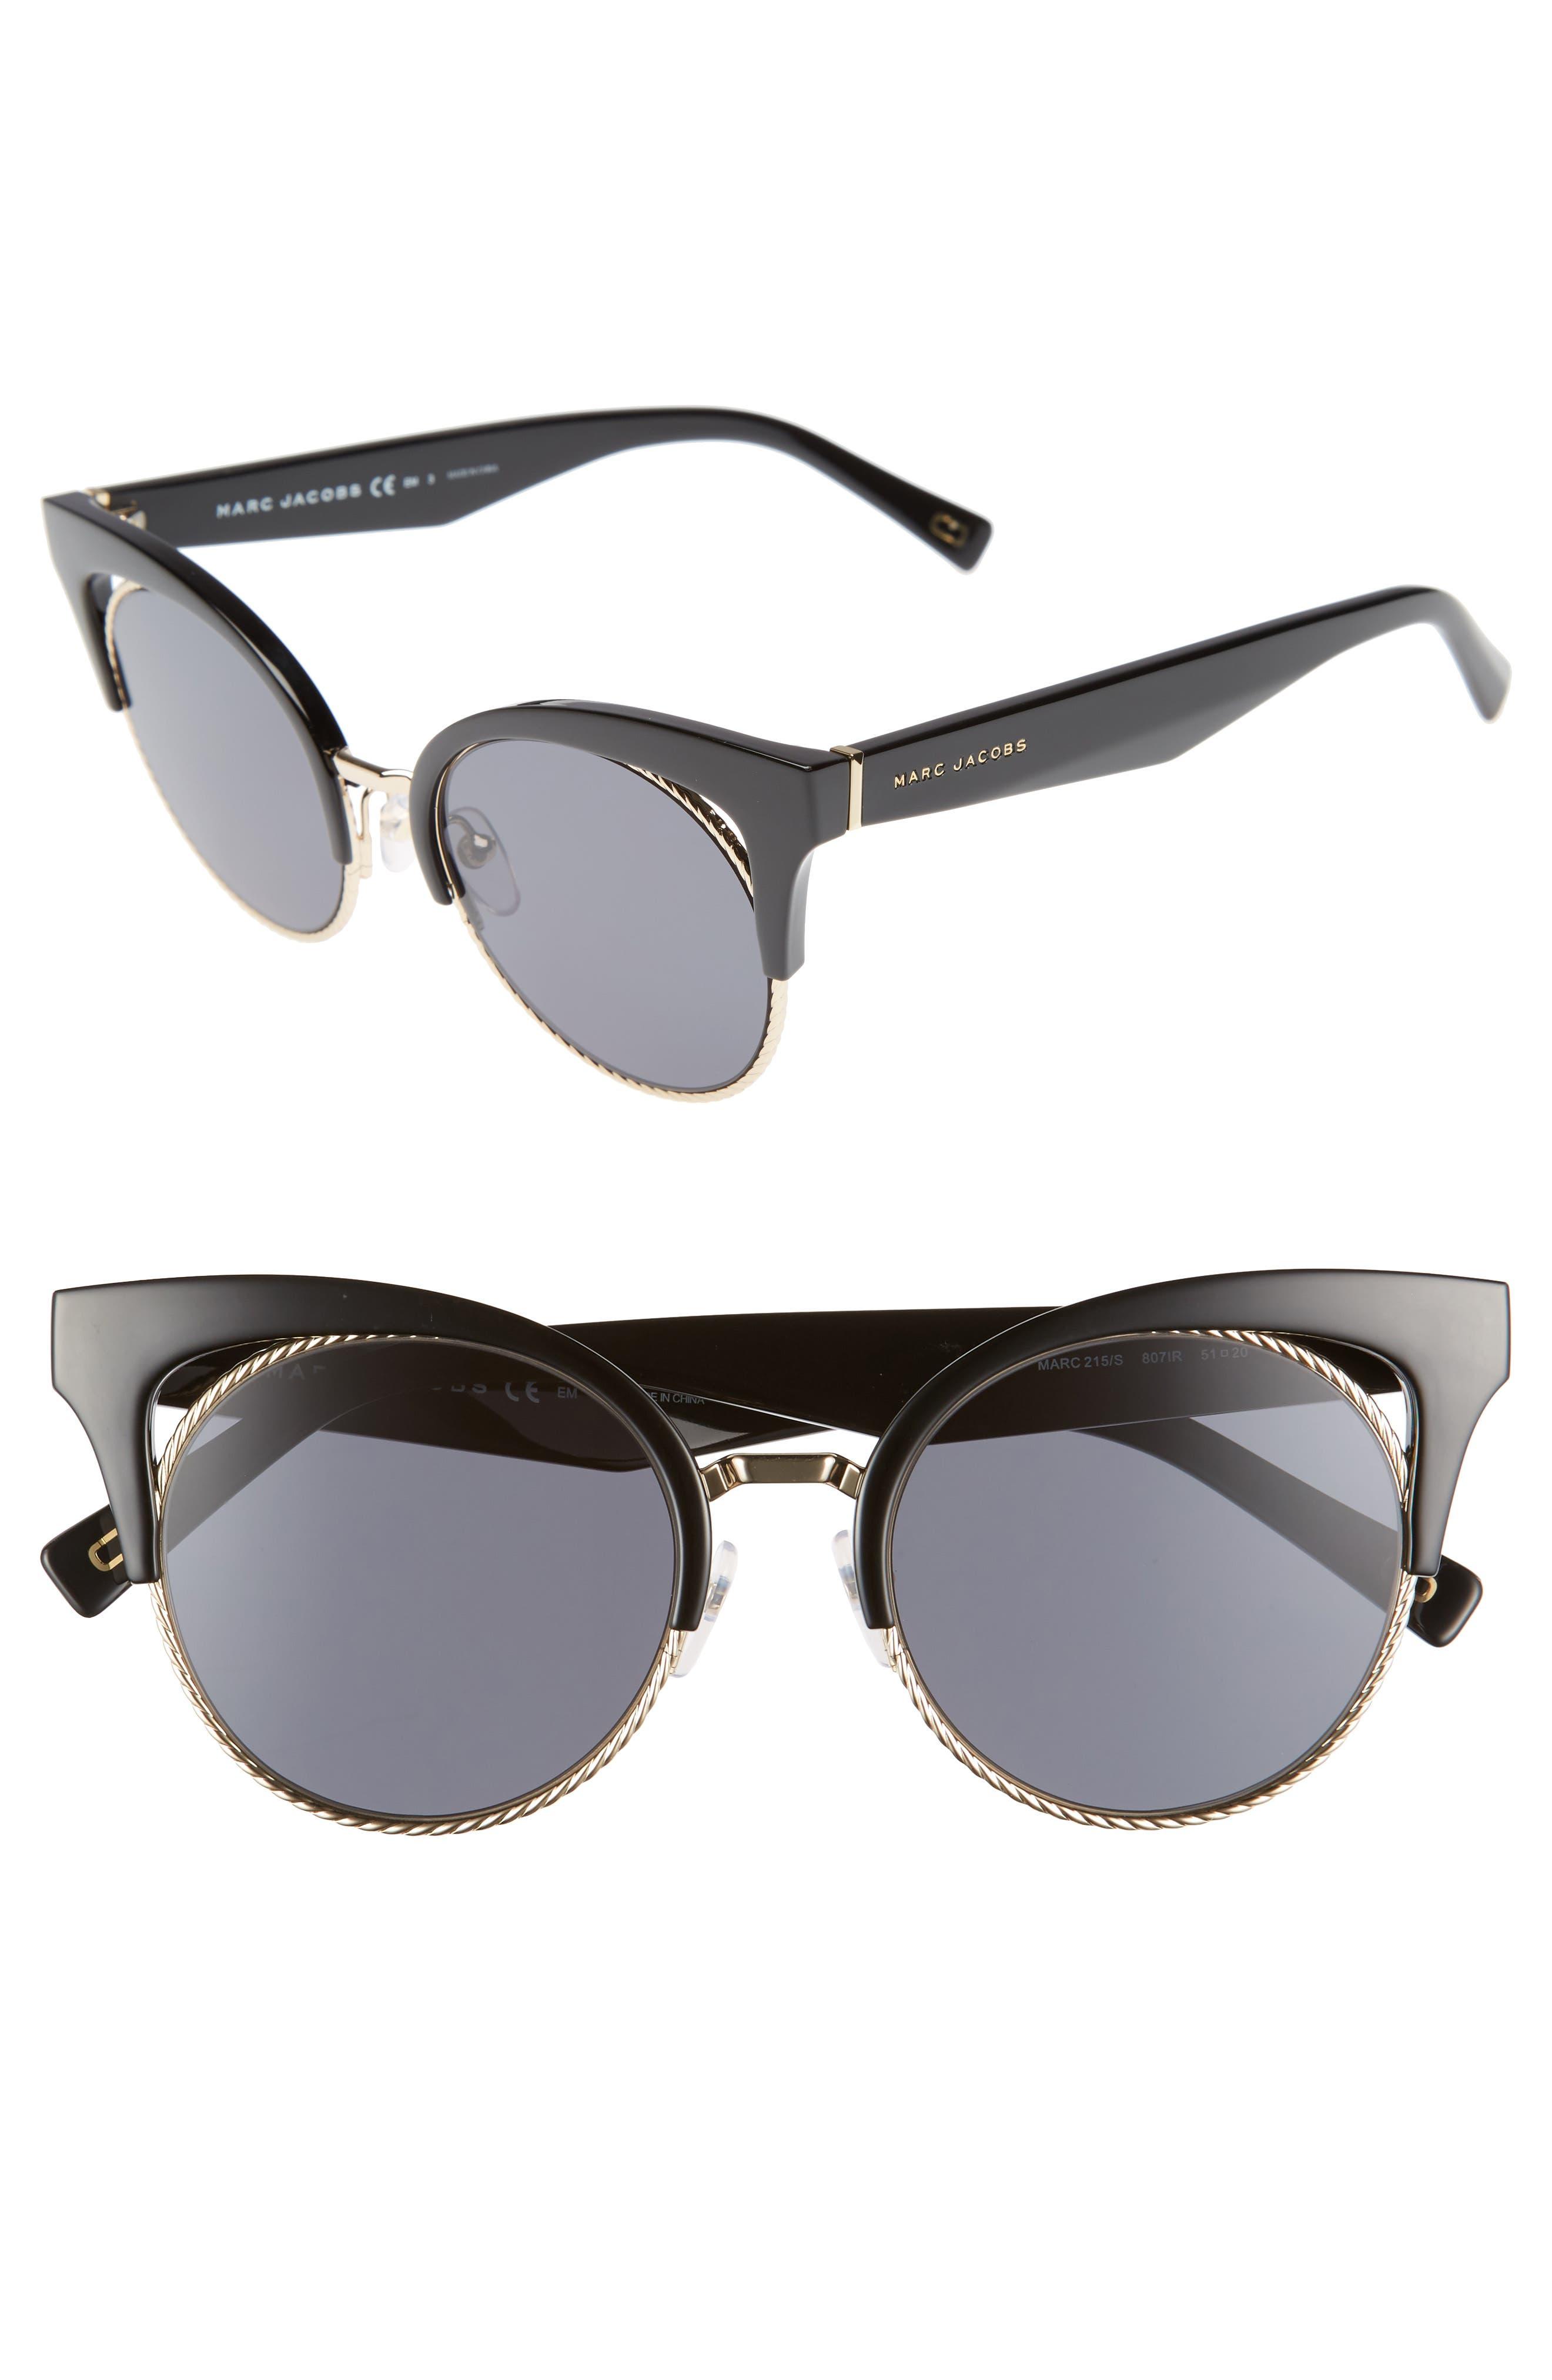 51mm Gradient Lens Cat Eye Sunglasses,                             Main thumbnail 1, color,